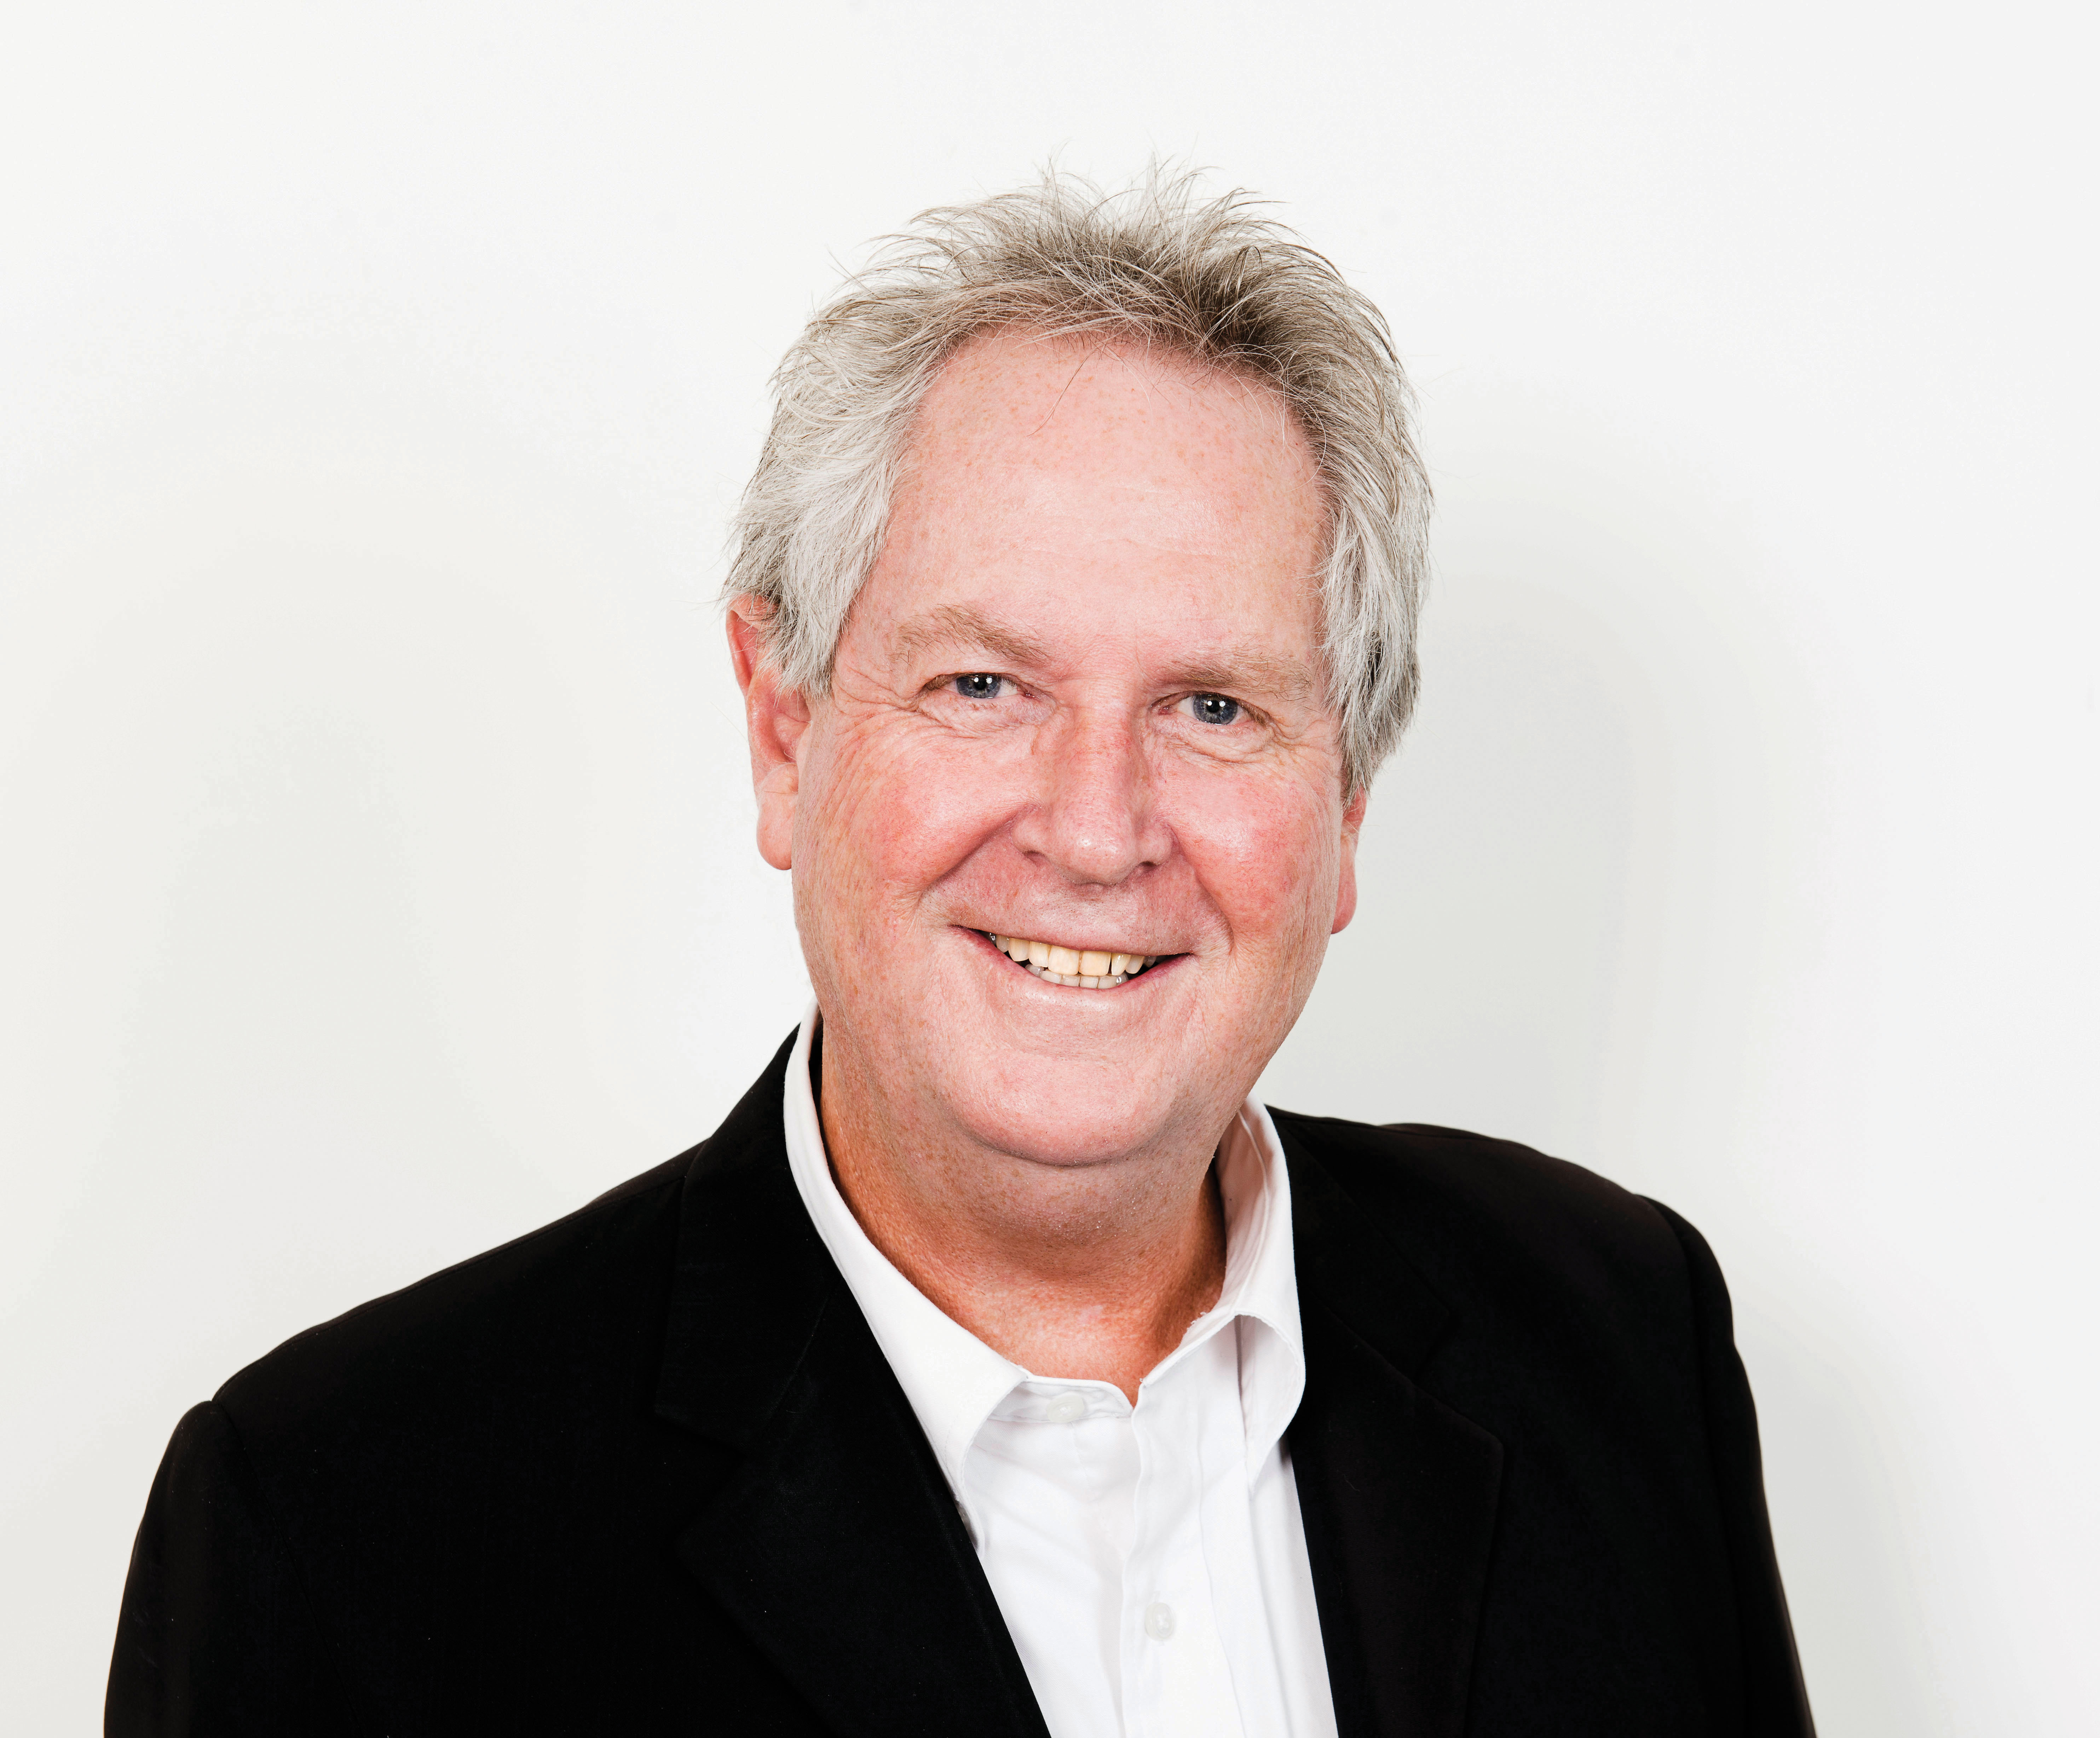 Chris_Severne_Waitemata_Local_Board_Auckland_Future.jpg